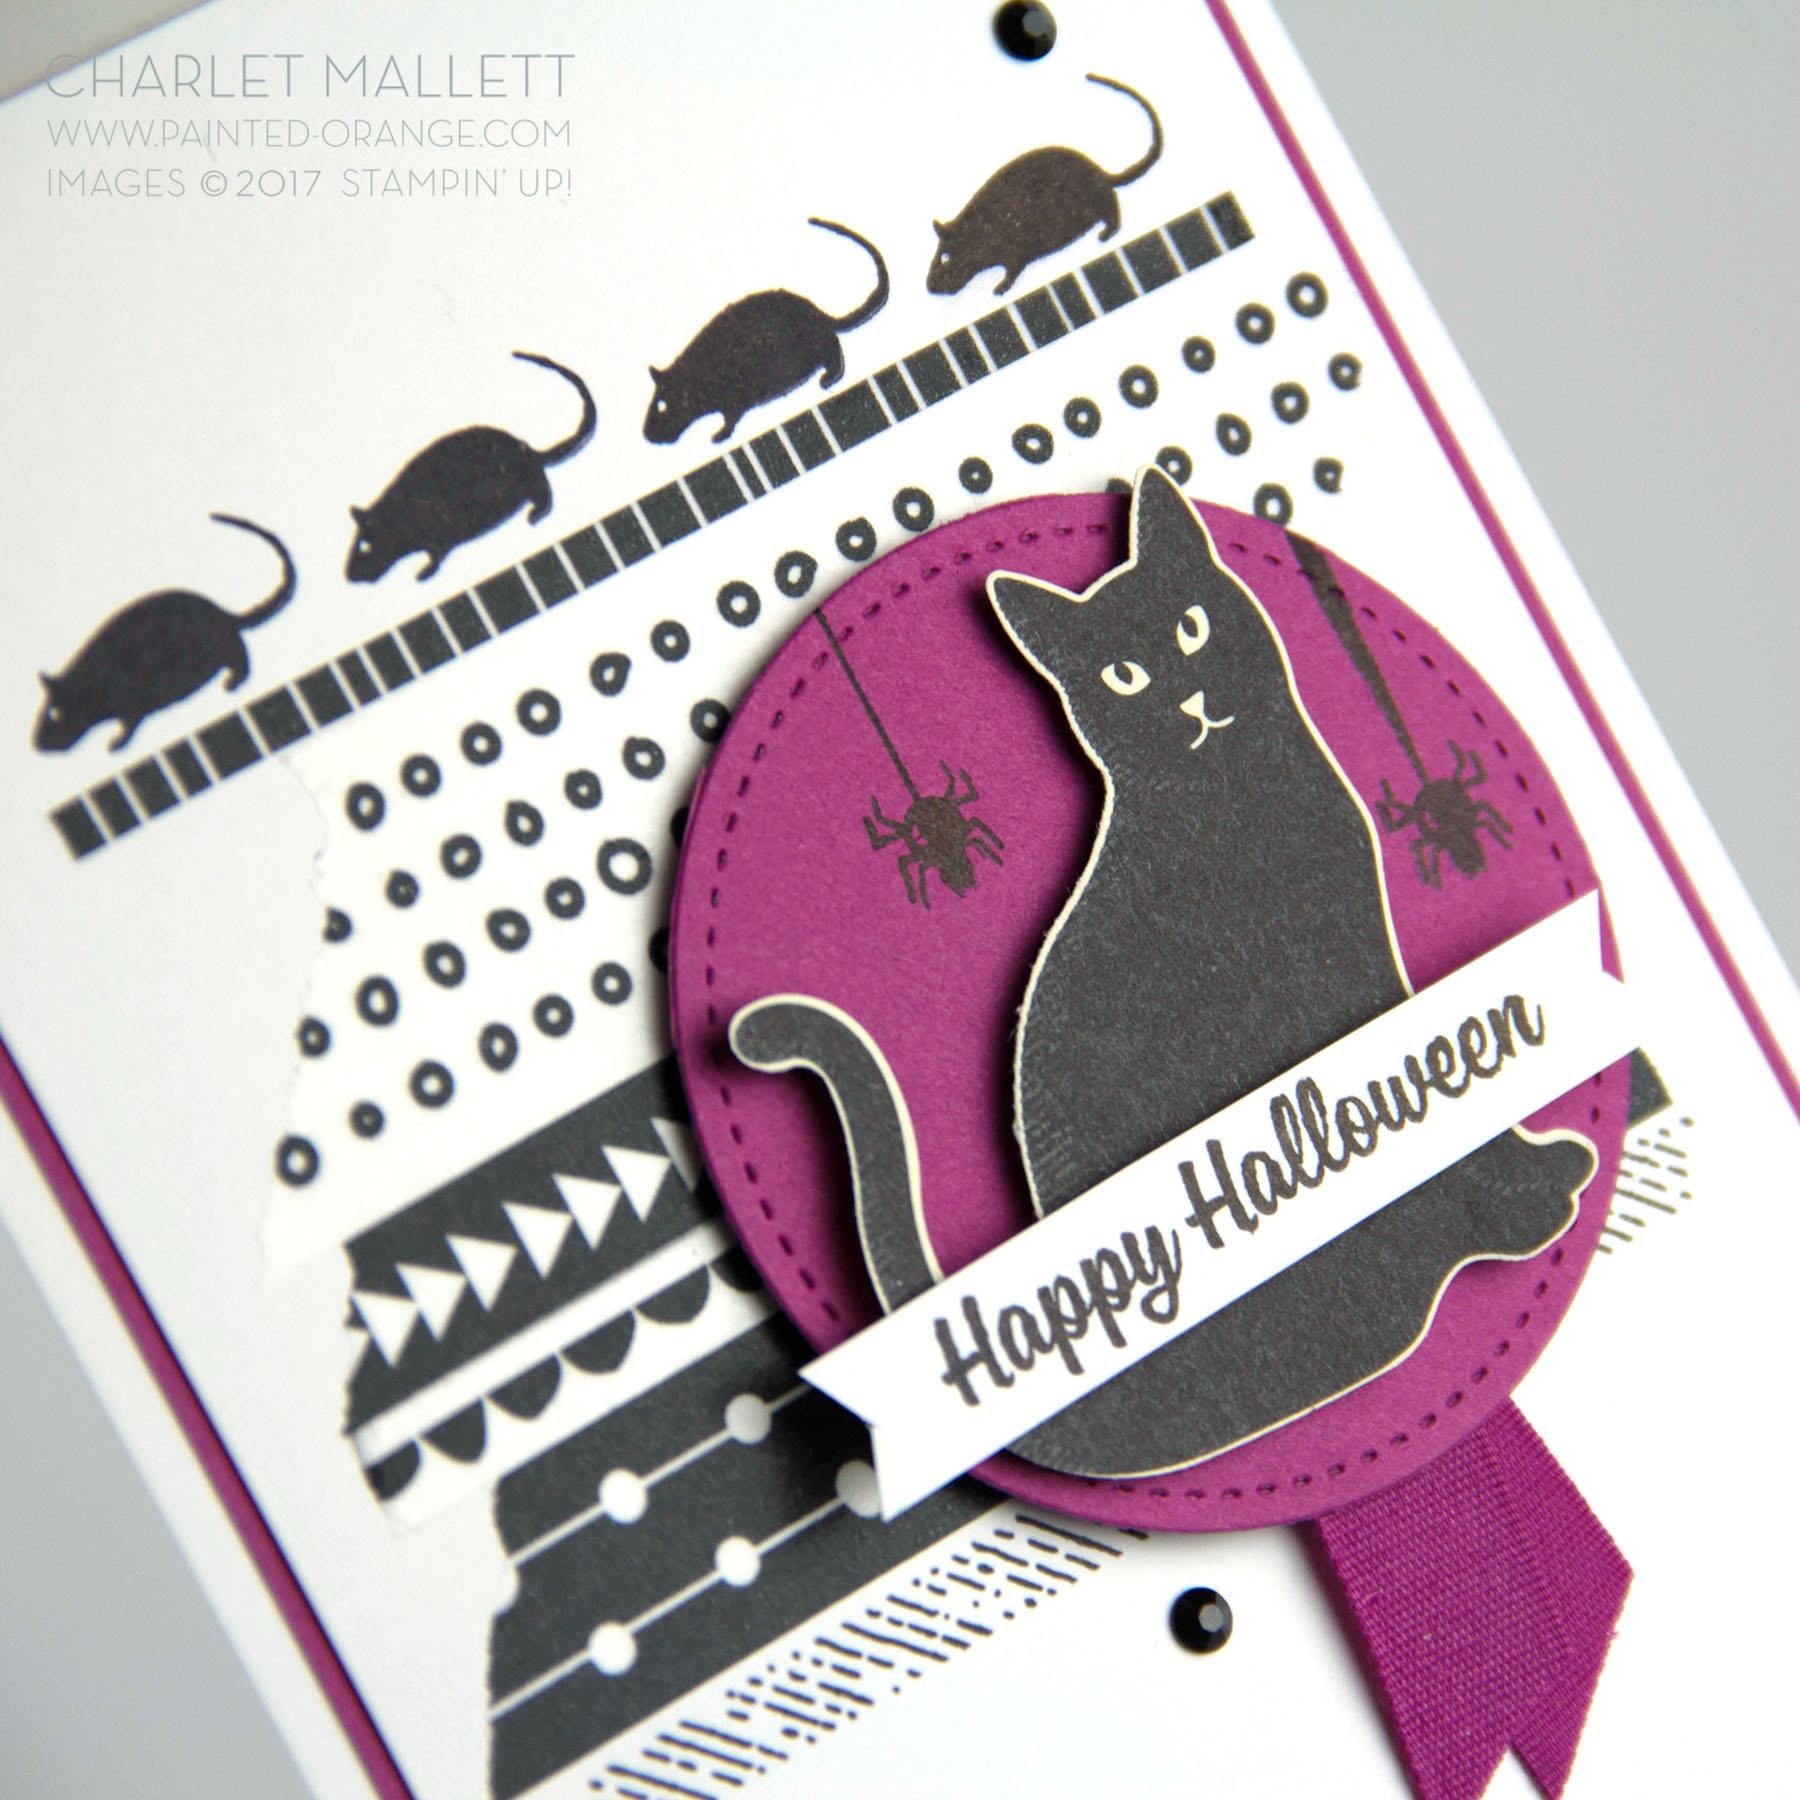 Spooky Cat Halloween card - Charlet Mallett, Stampin' Up!